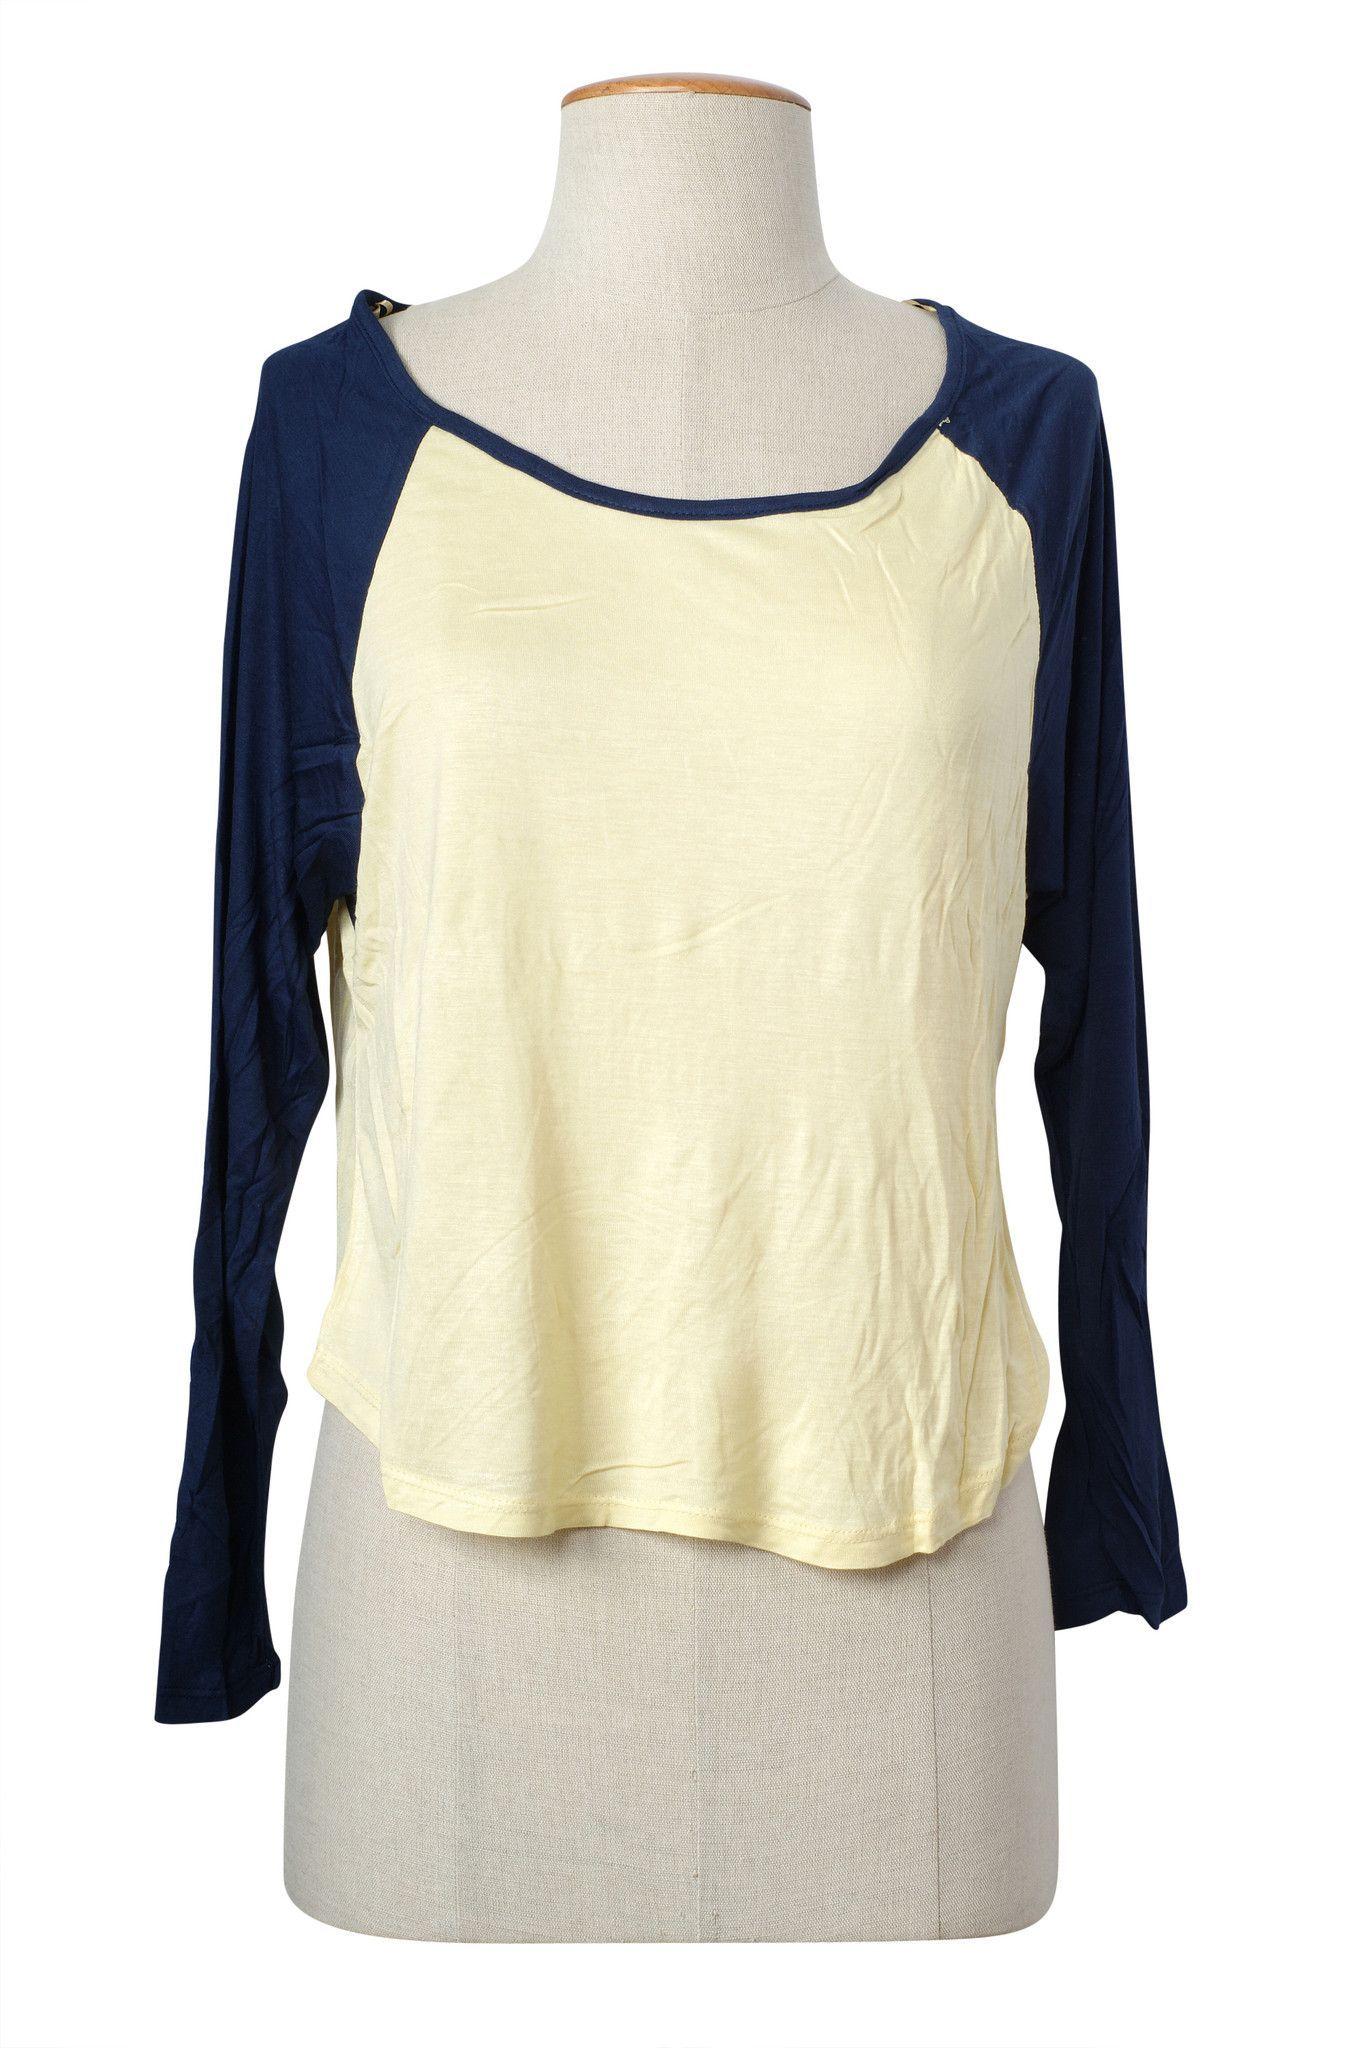 Casual Color Block Scoop Neck Raglan Long Sleeve Cropped Tee Shirt Top